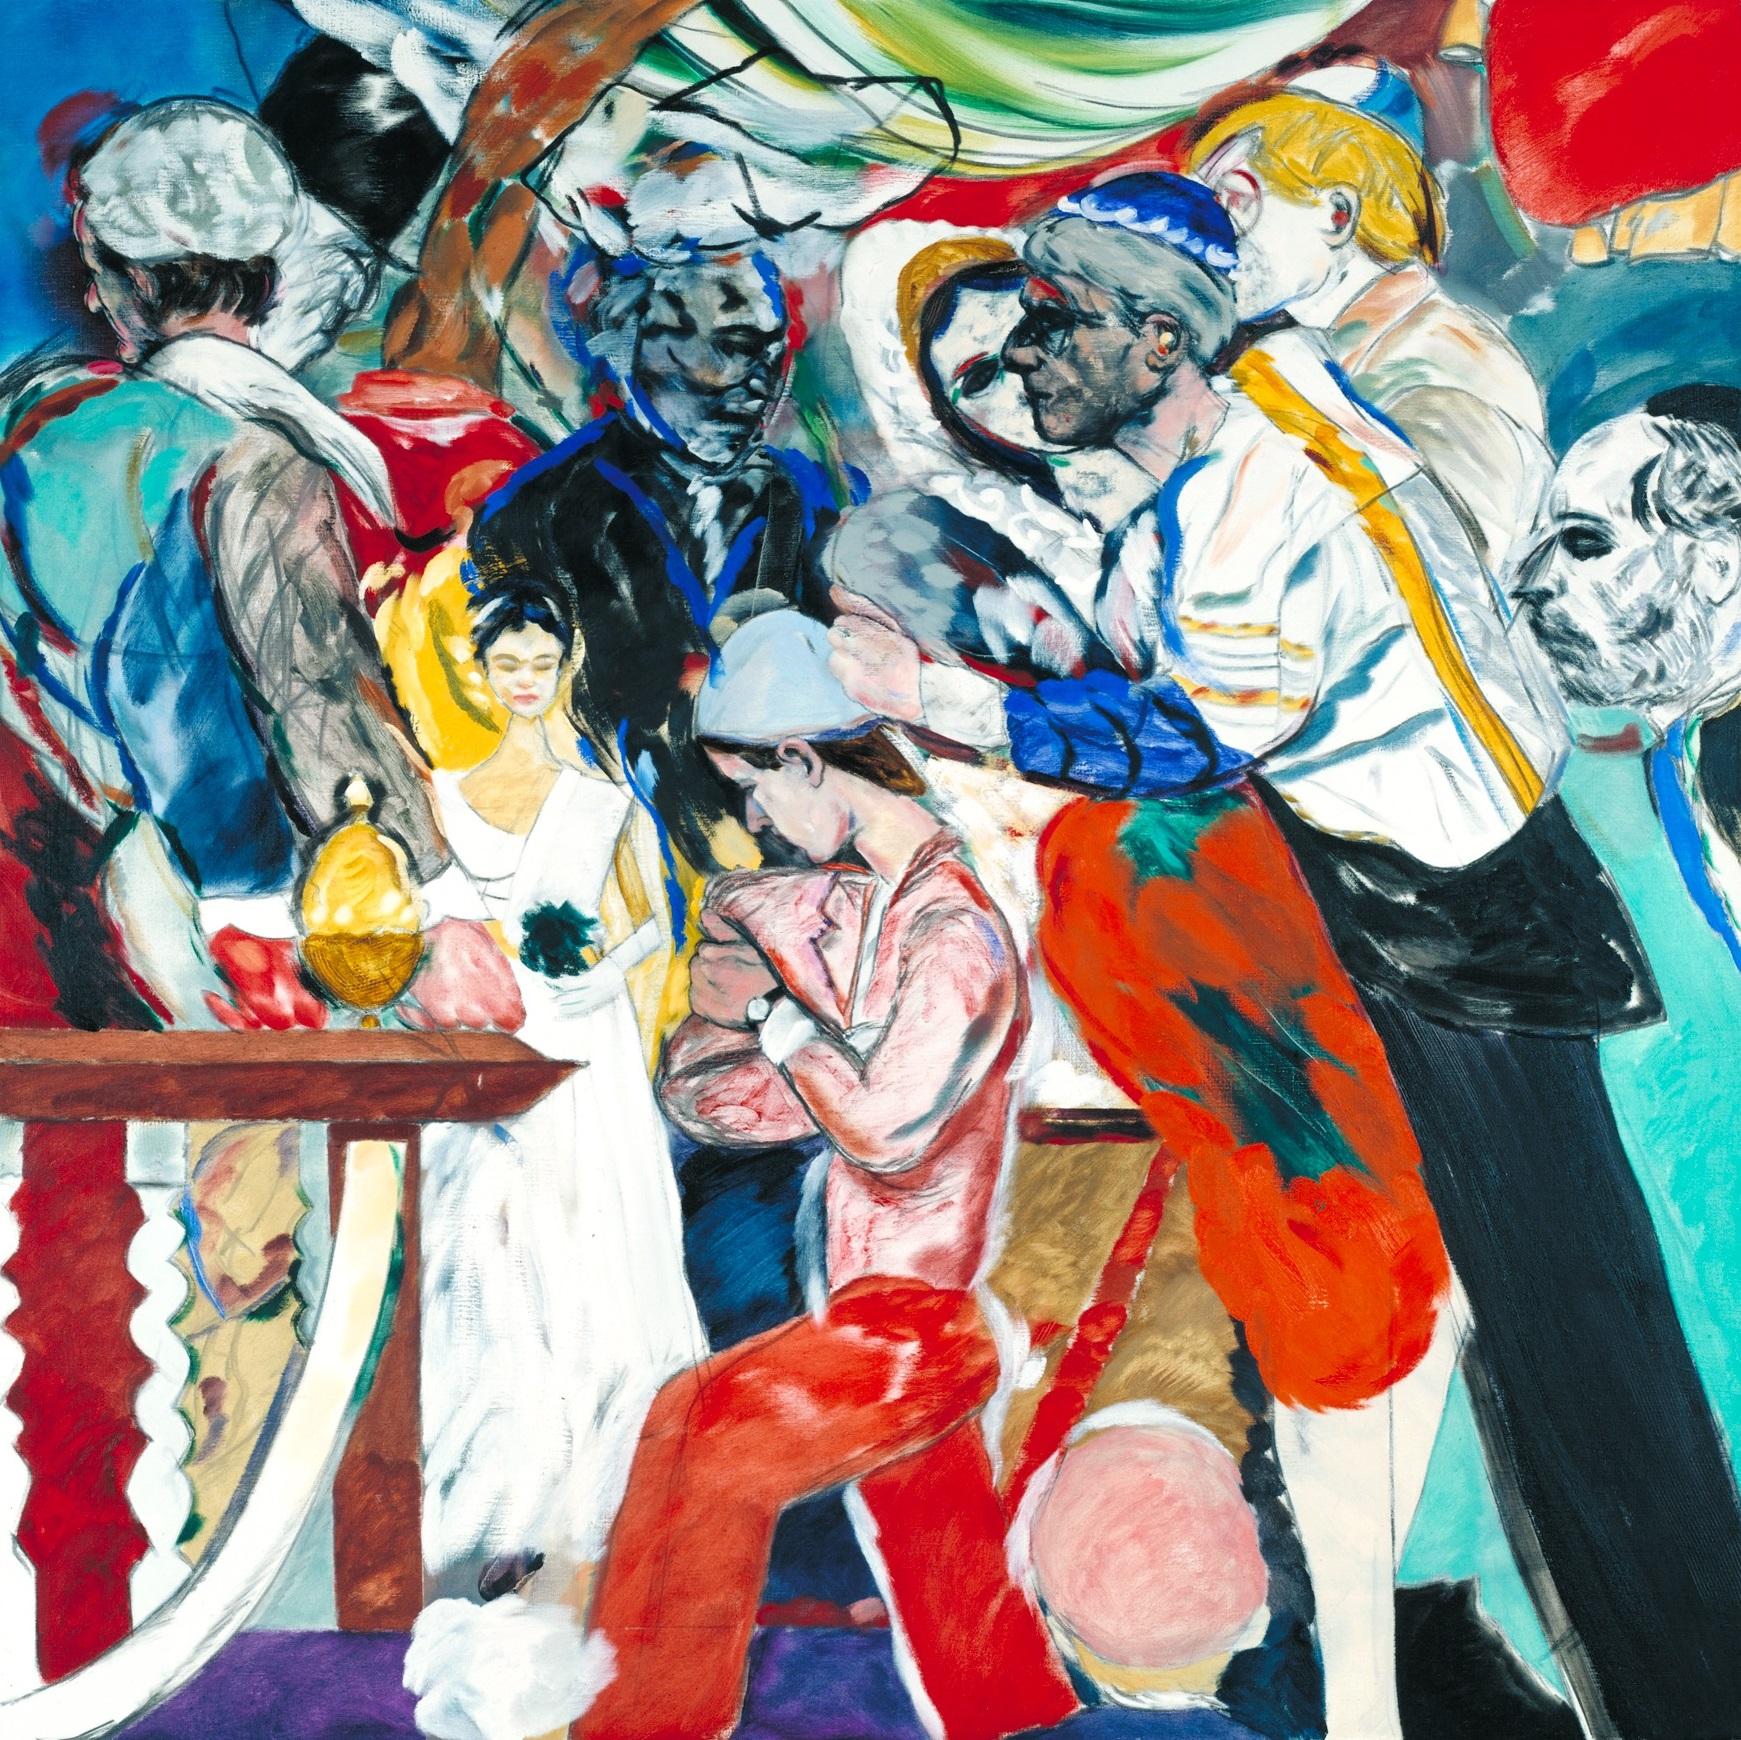 R.B. Kitaj 1932-2007 | The Wedding |1989-93 | Oil paint on canvas | 1829 x 1829 mm | Tate | © The estate of R. B. Kitaj